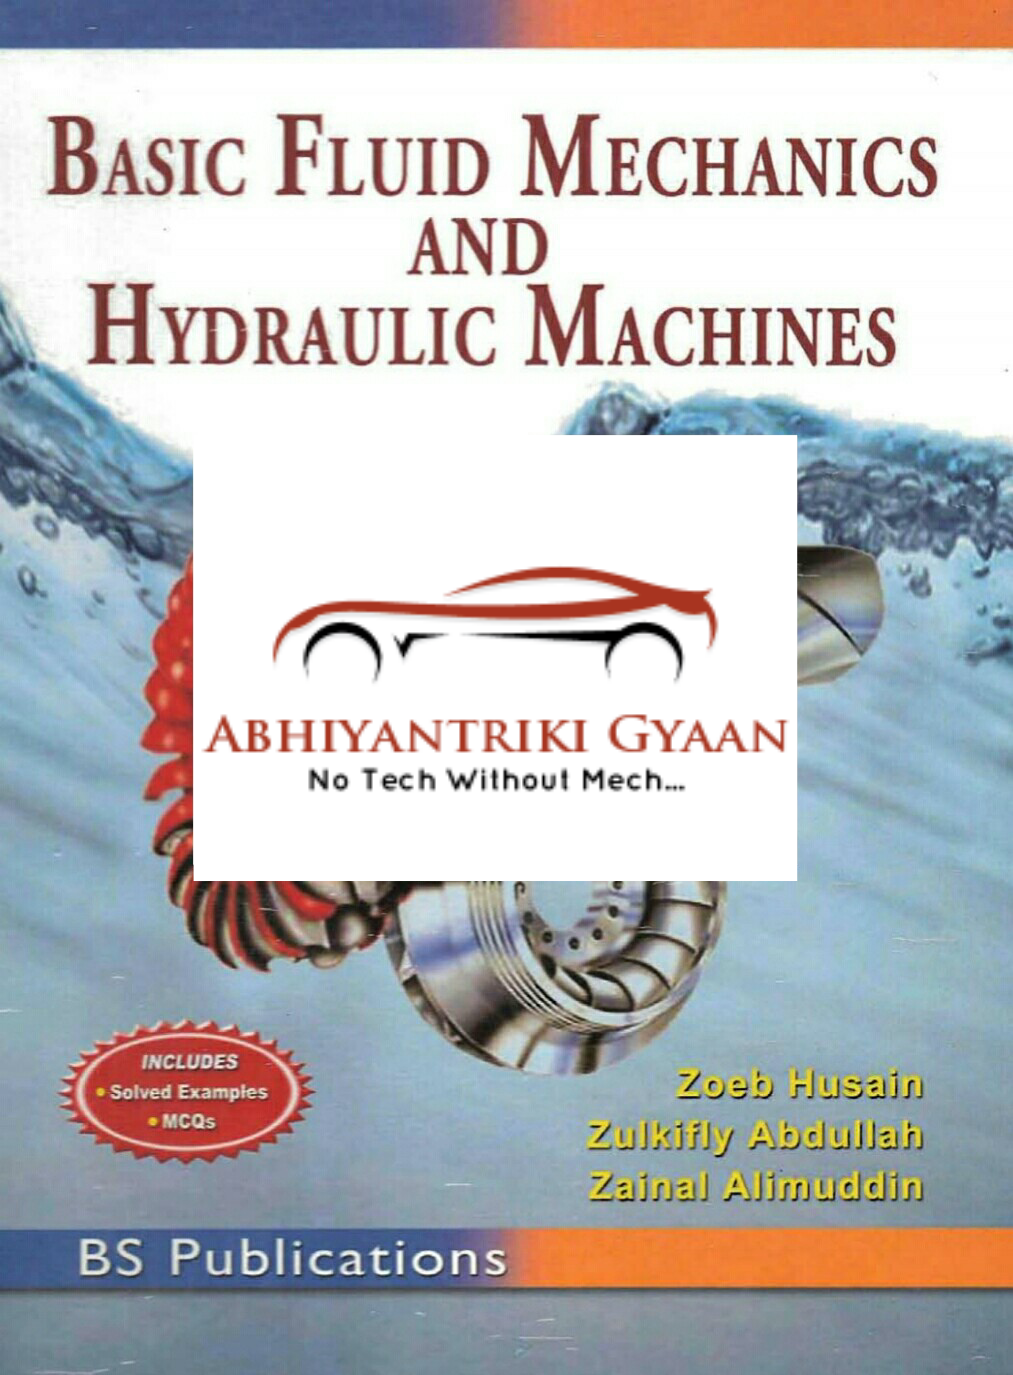 basic fluid mechanics Basic principles of fluid mechanics ventilation is the application of the principles of fluid dynamics to the flow of air in underground openings.